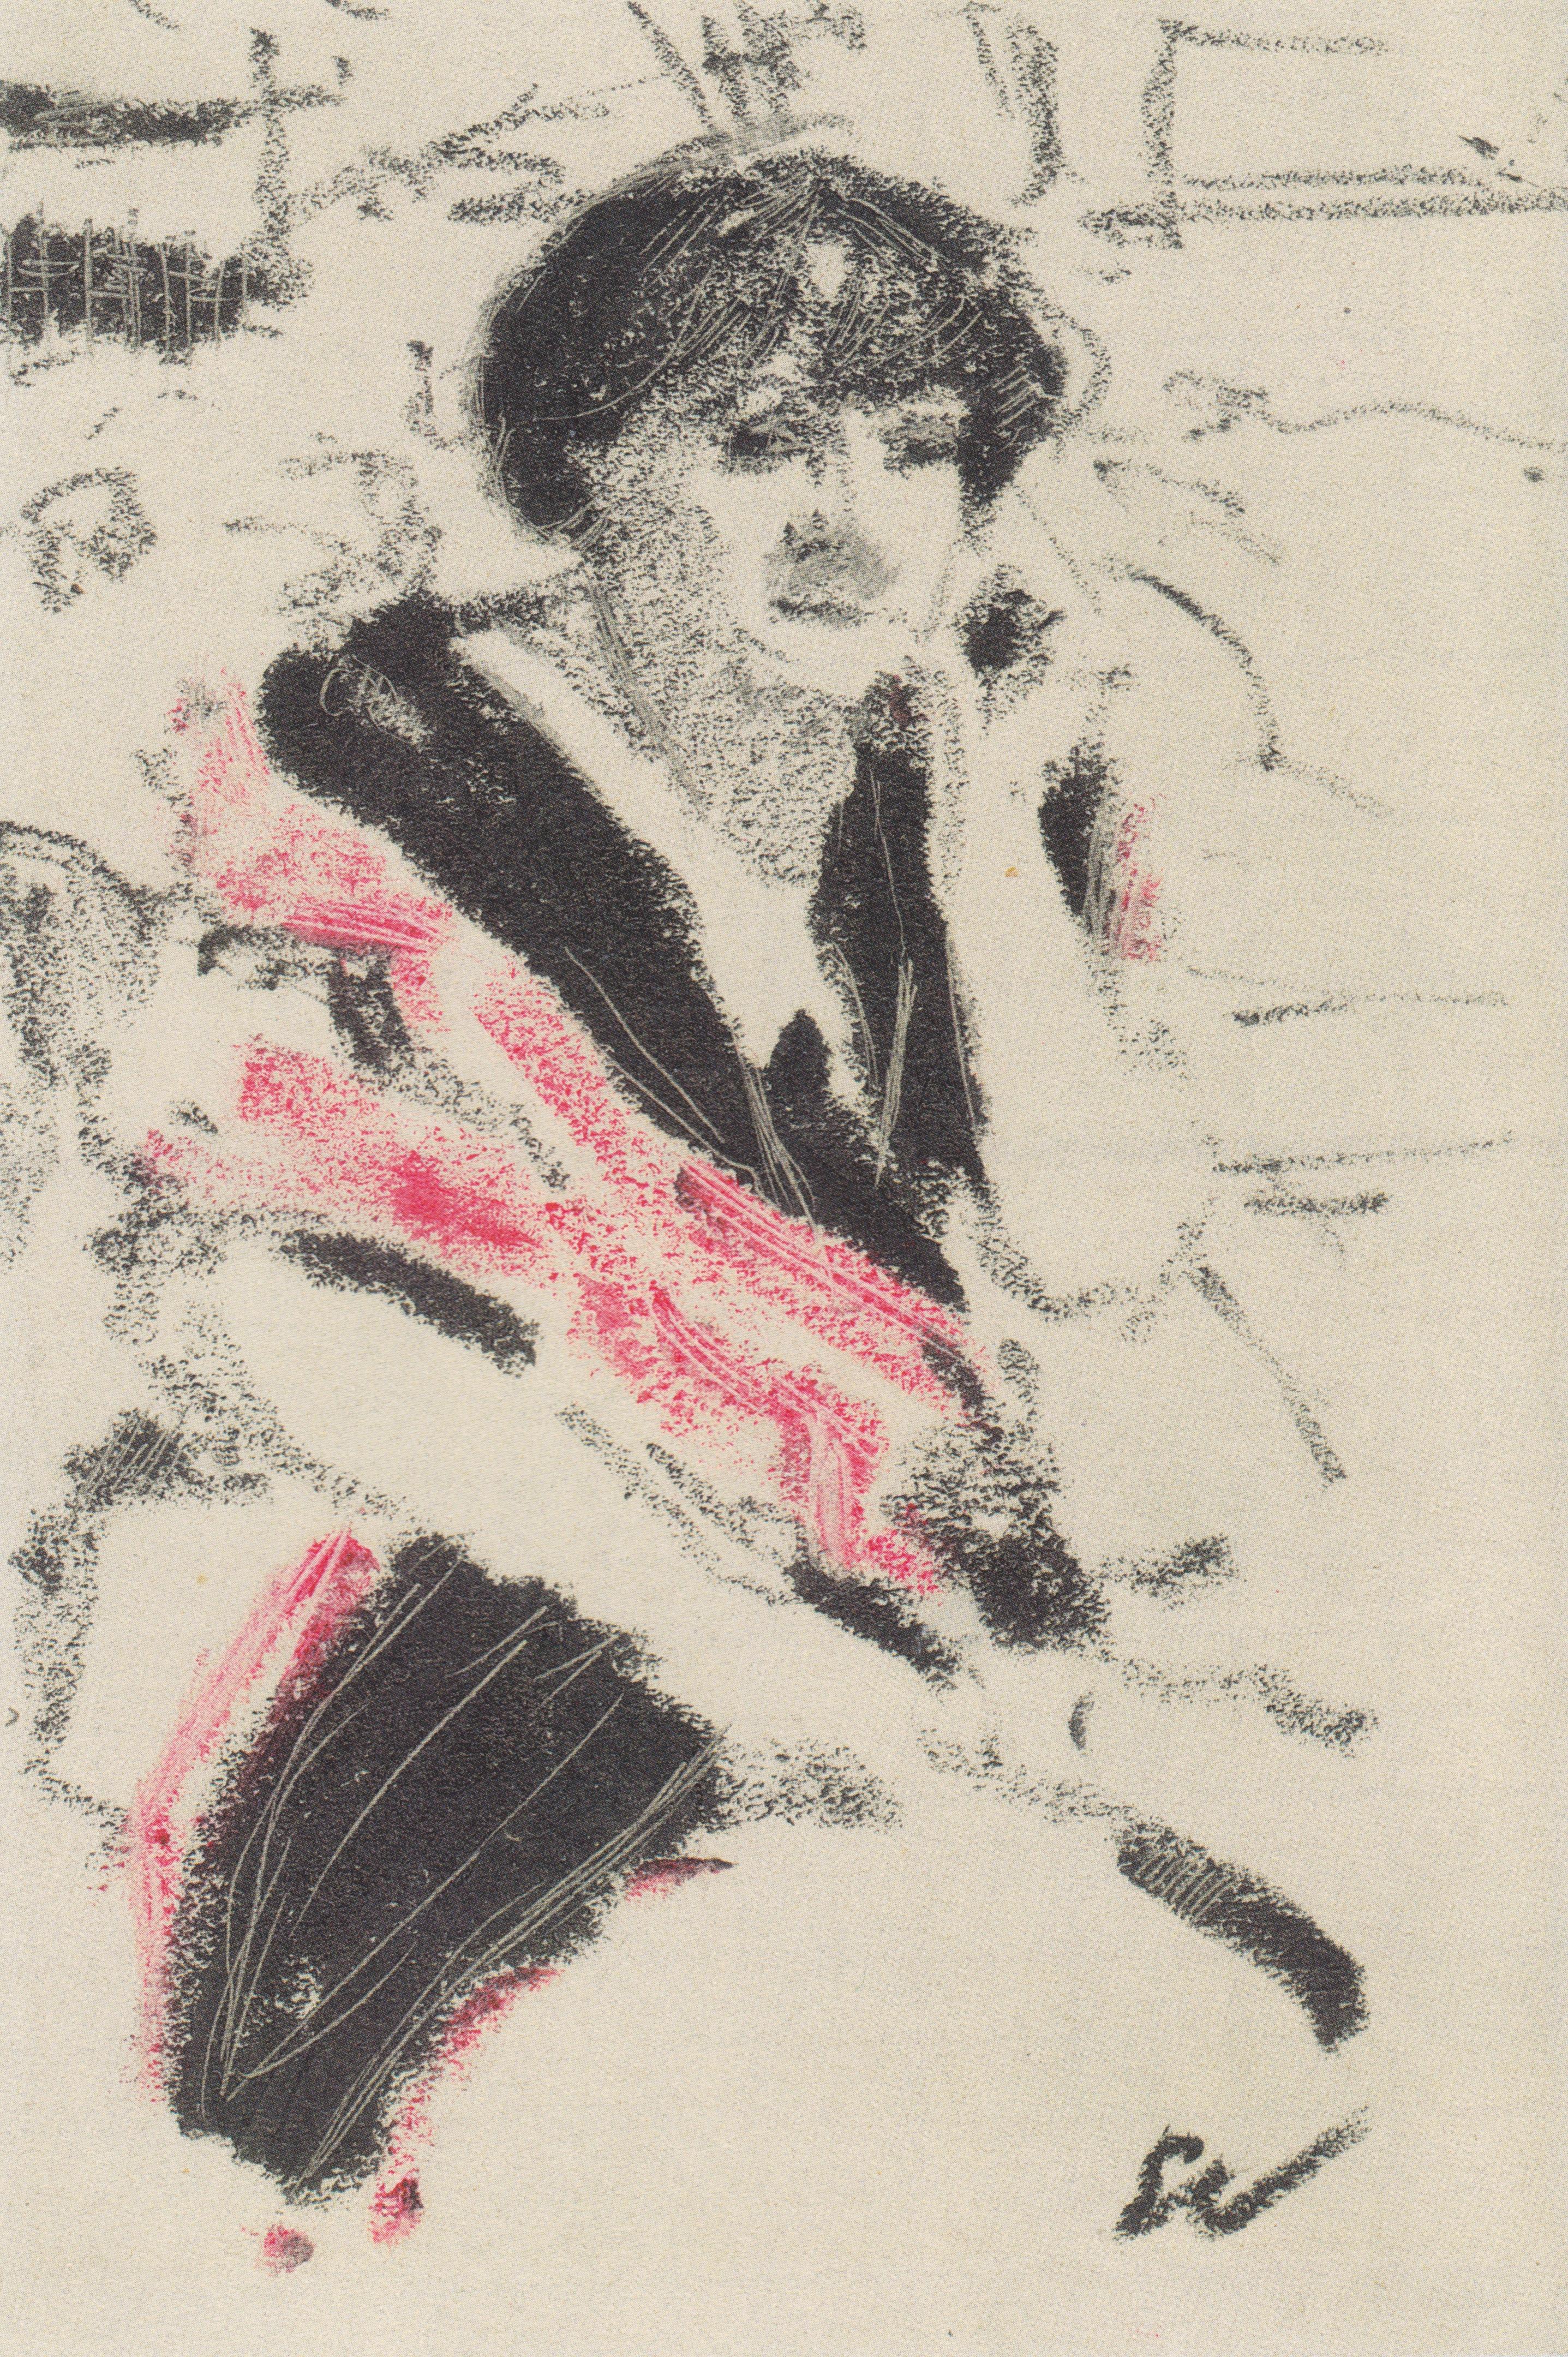 Edouard Vuillard Drawings File:édouard Vuillard